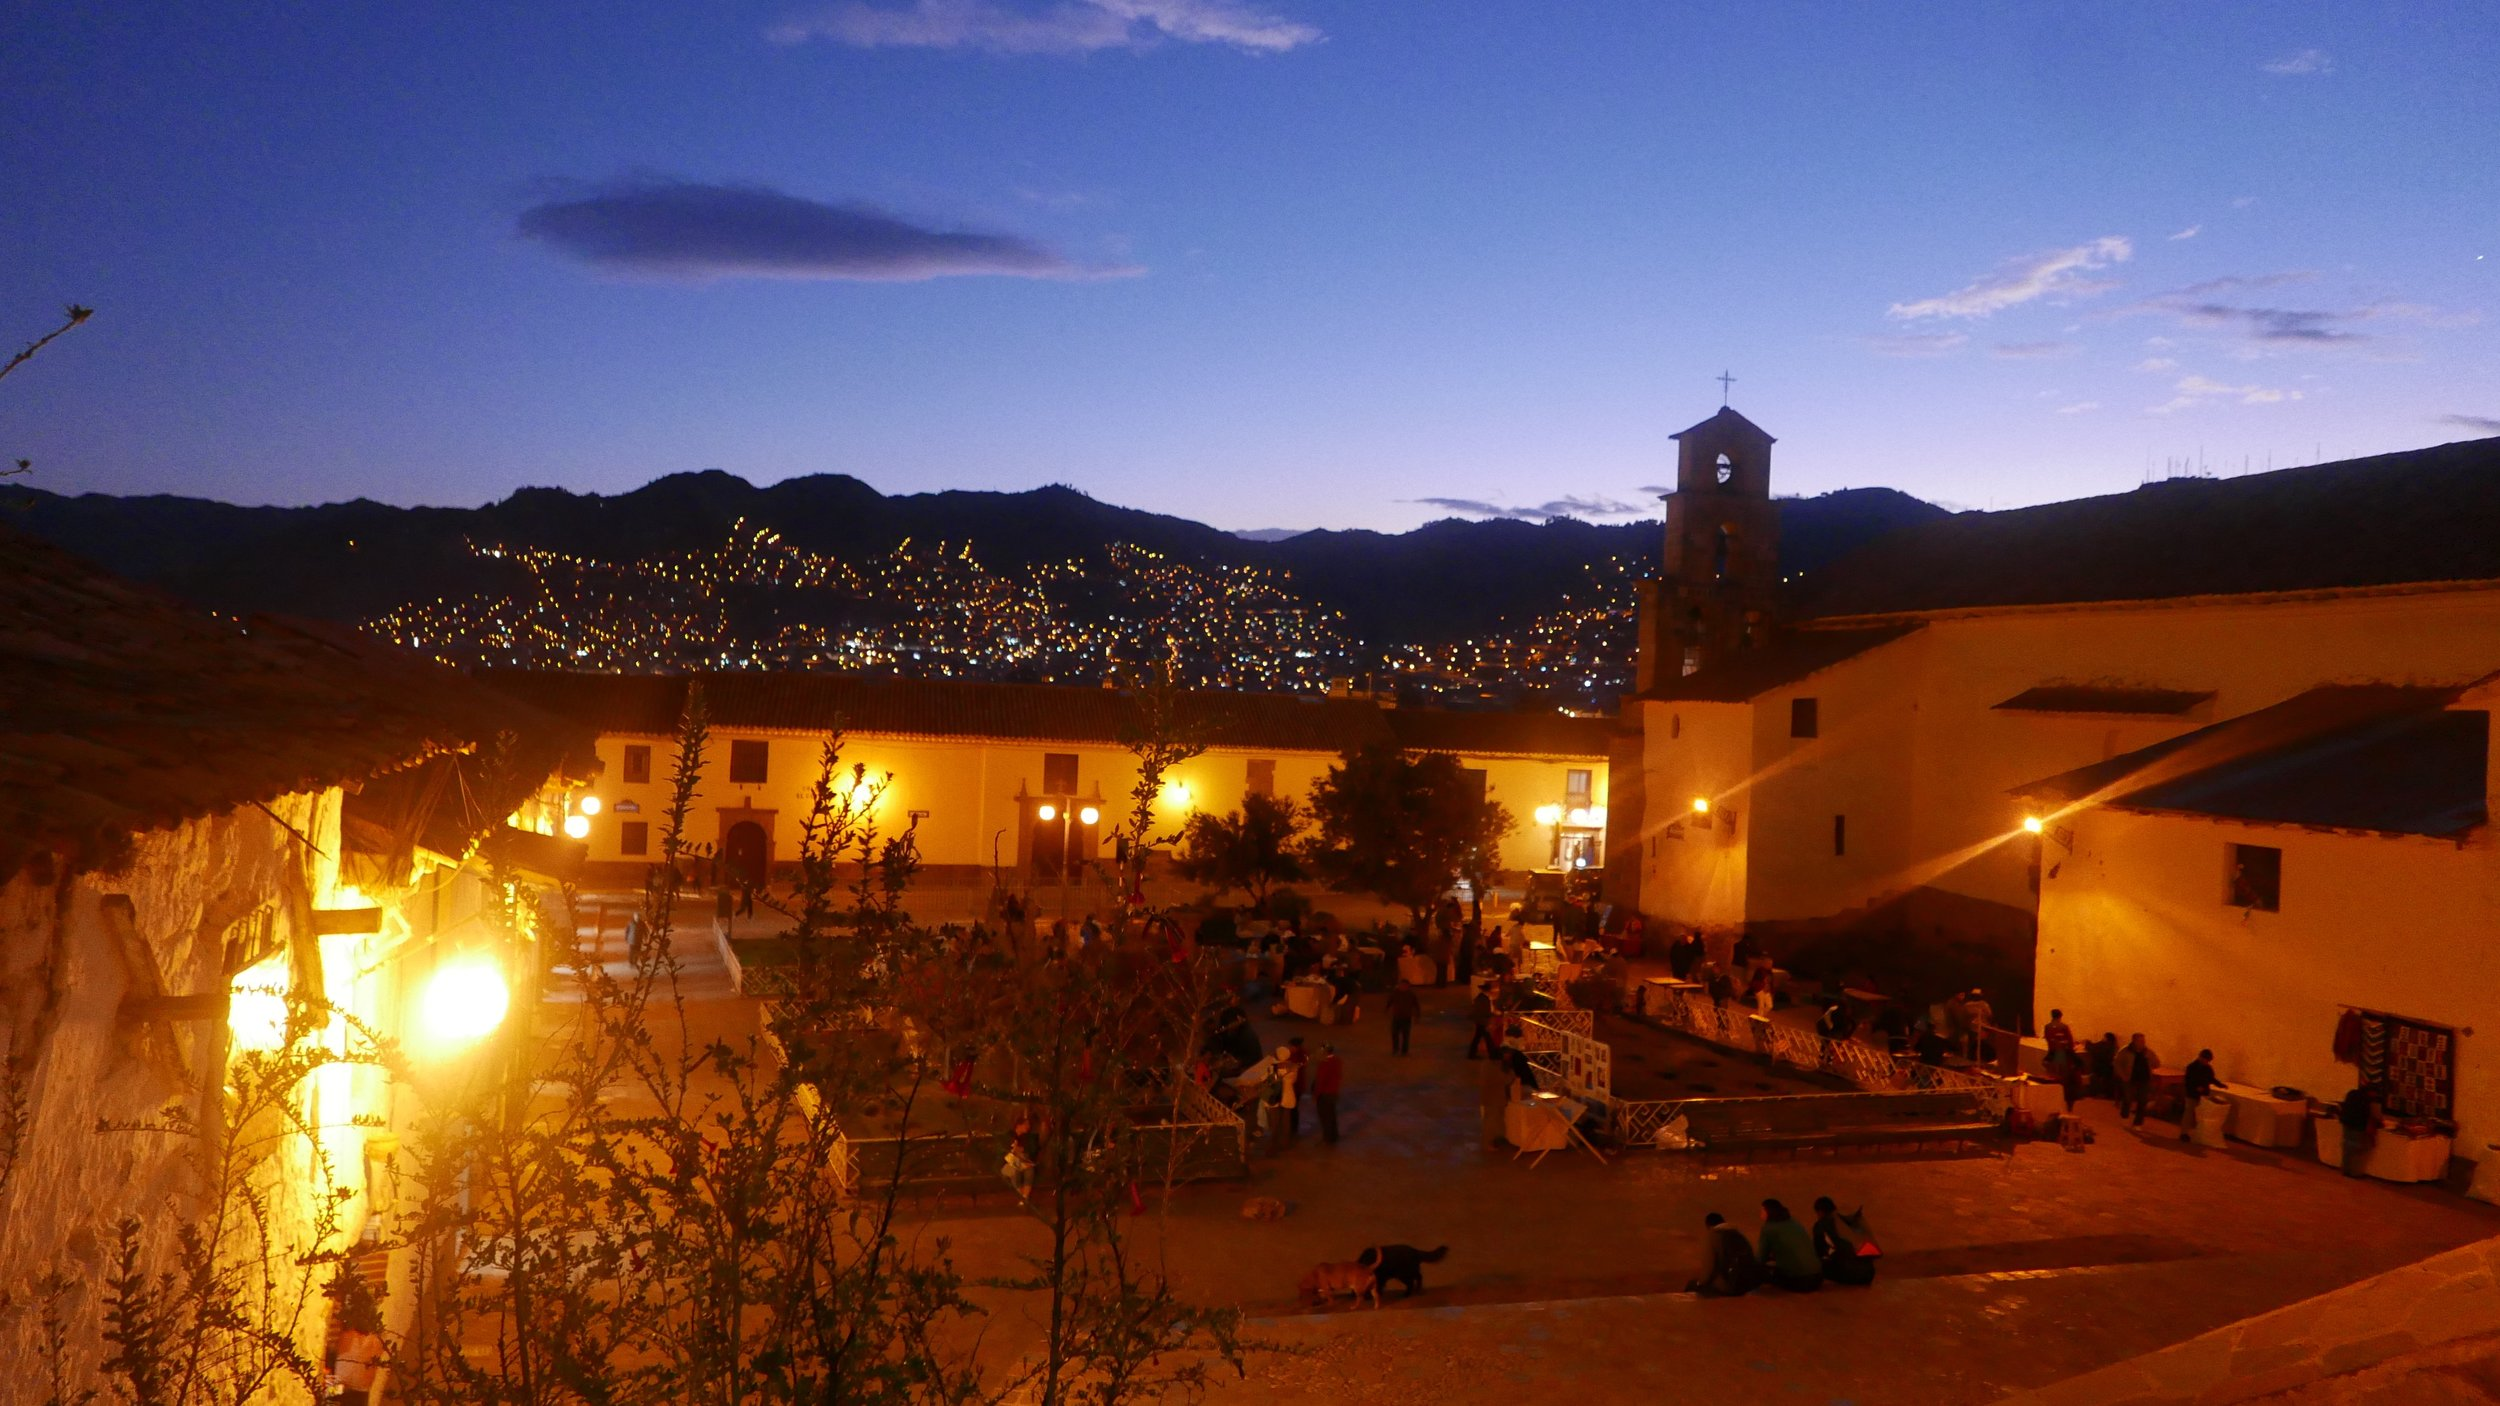 san-blas-at-night-cuzco-peru.jpg